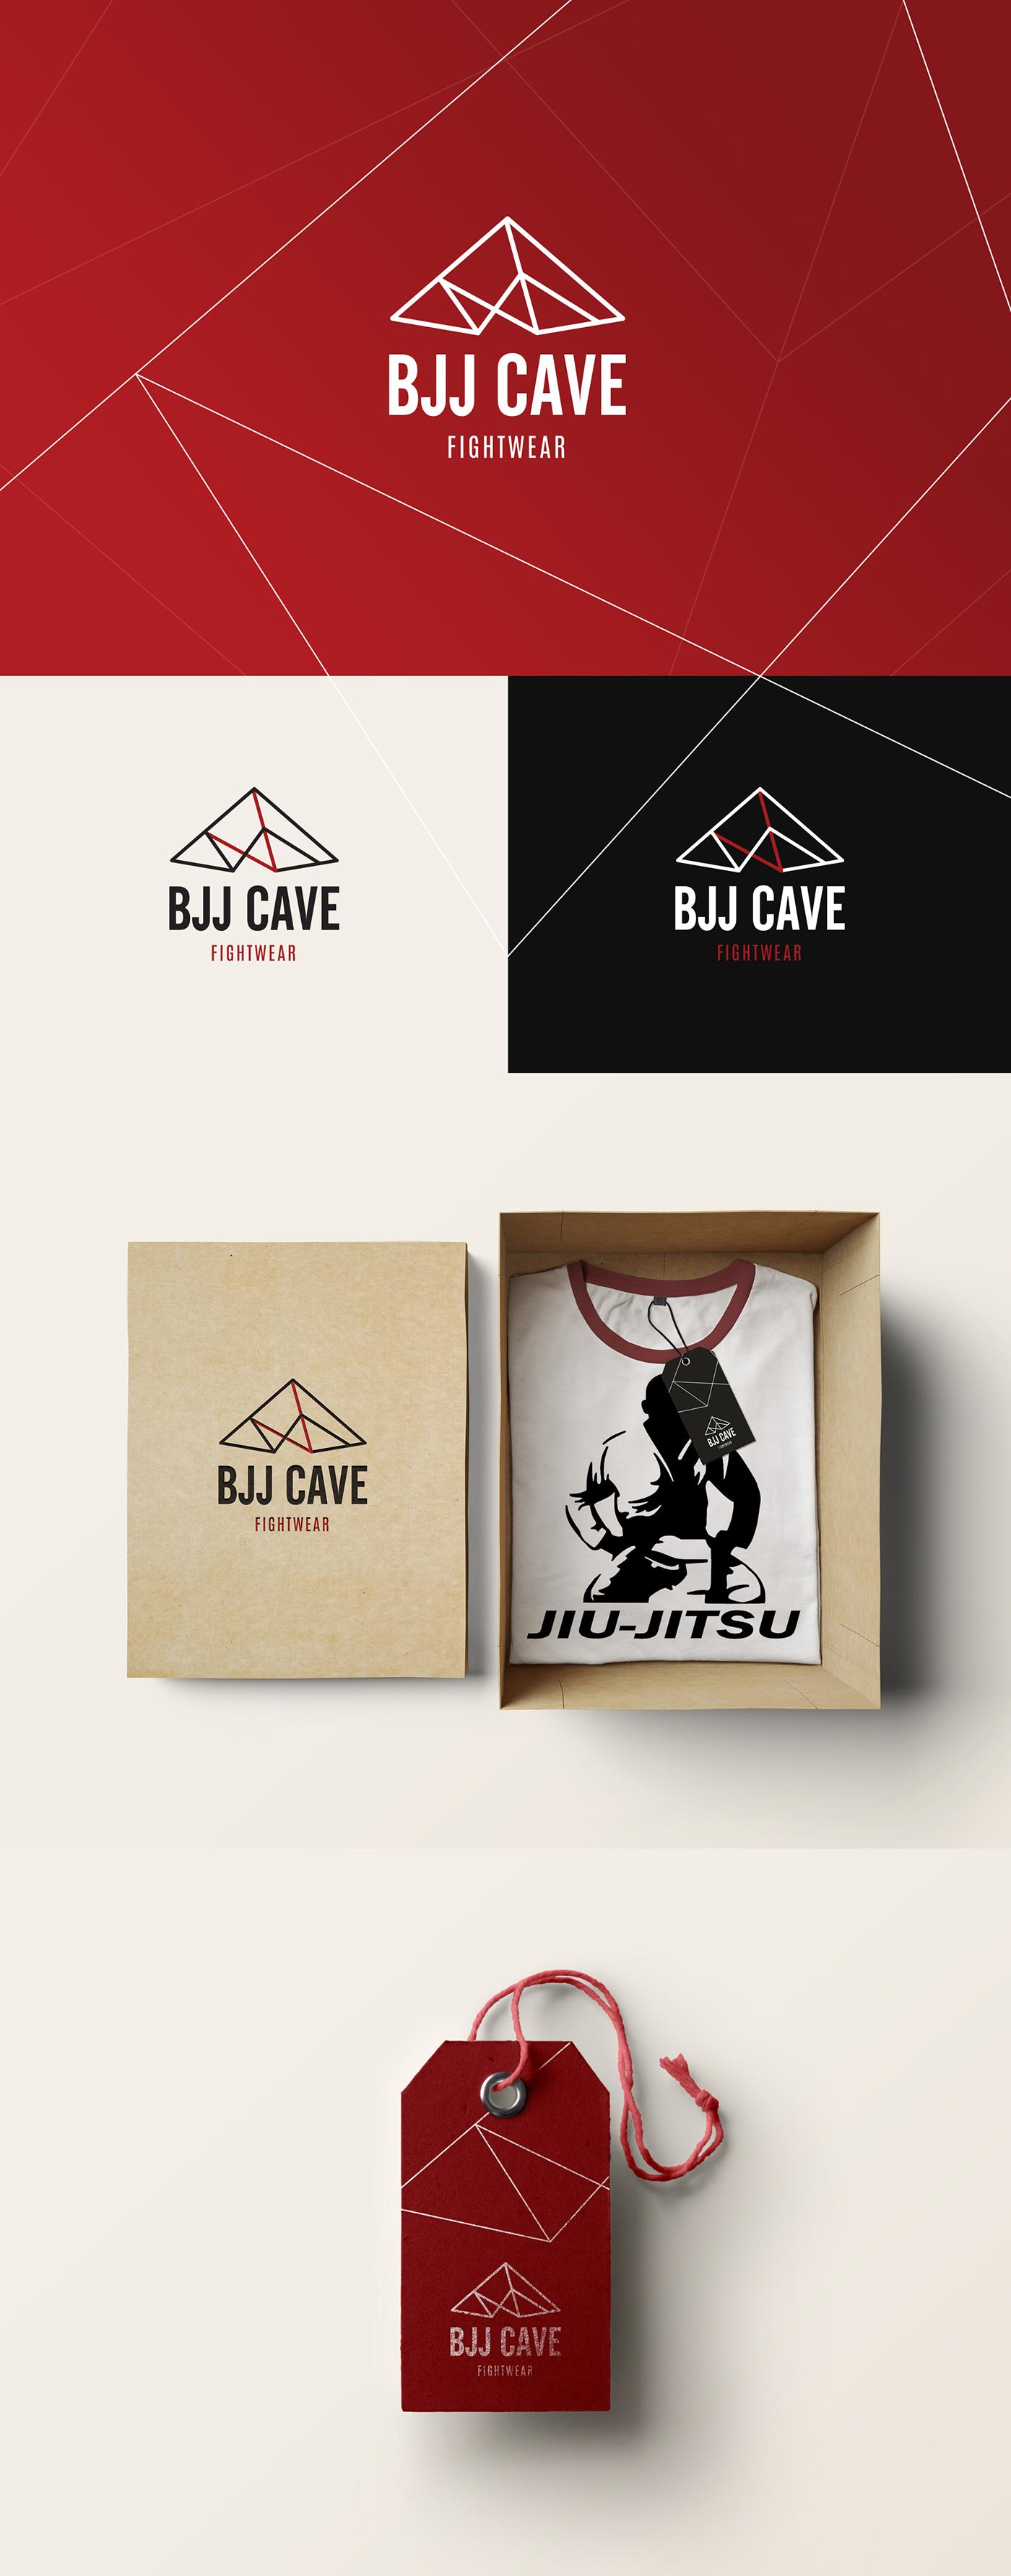 cave jiu-jitsu fight clothes store red black lines geometric concept